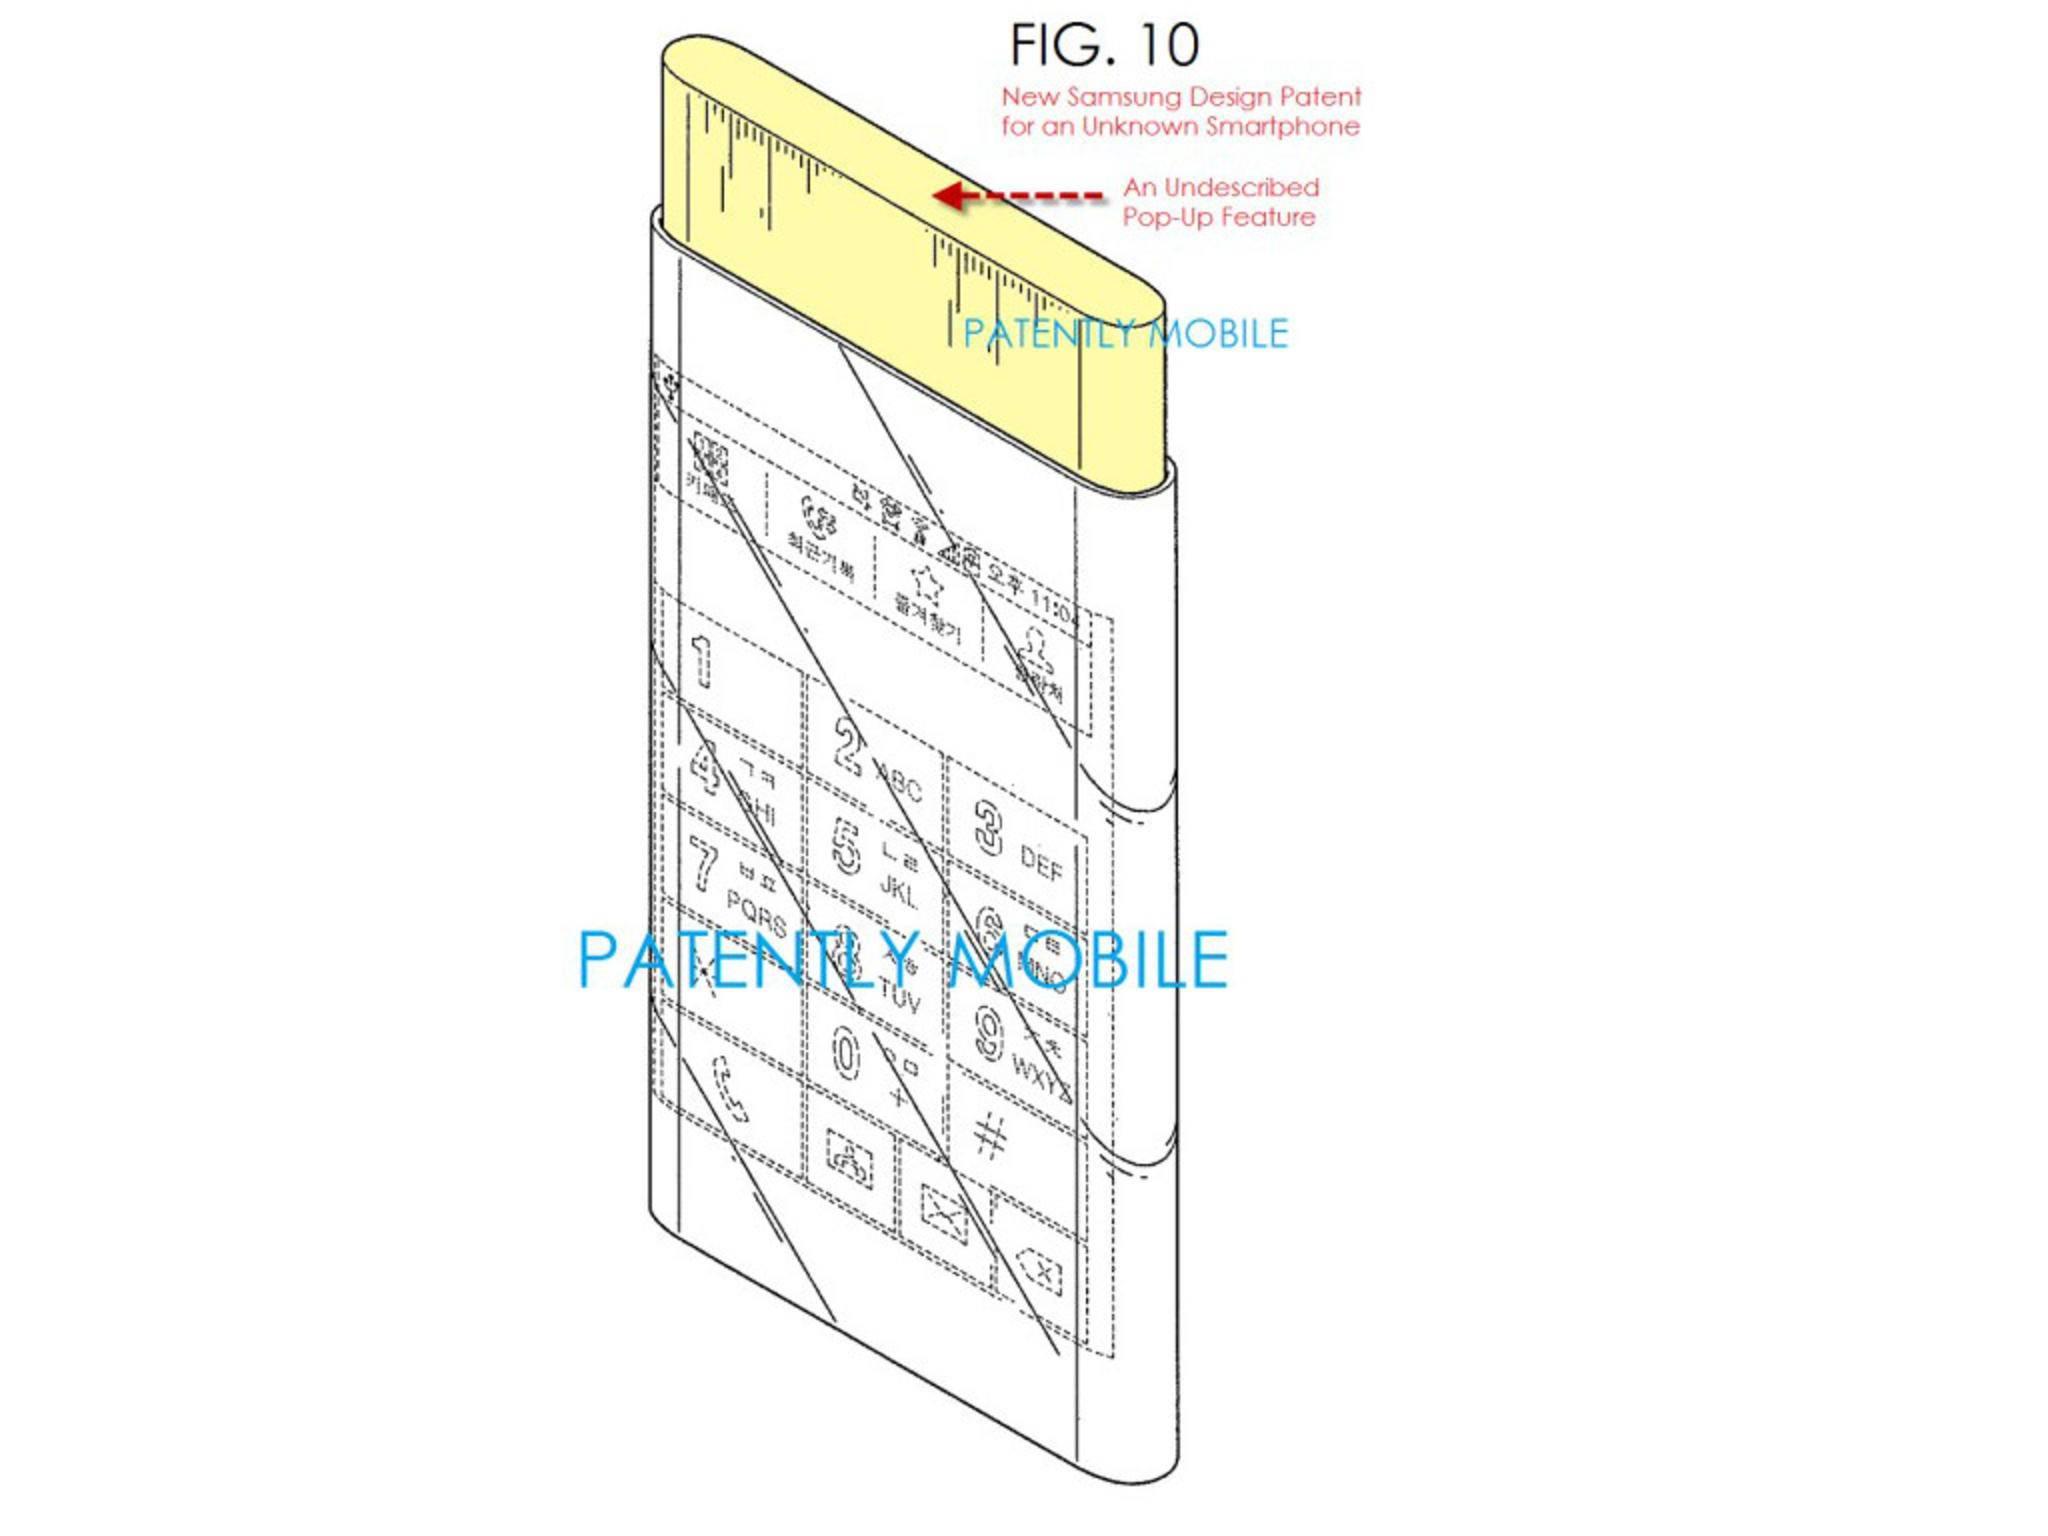 Samsung Design-Patent